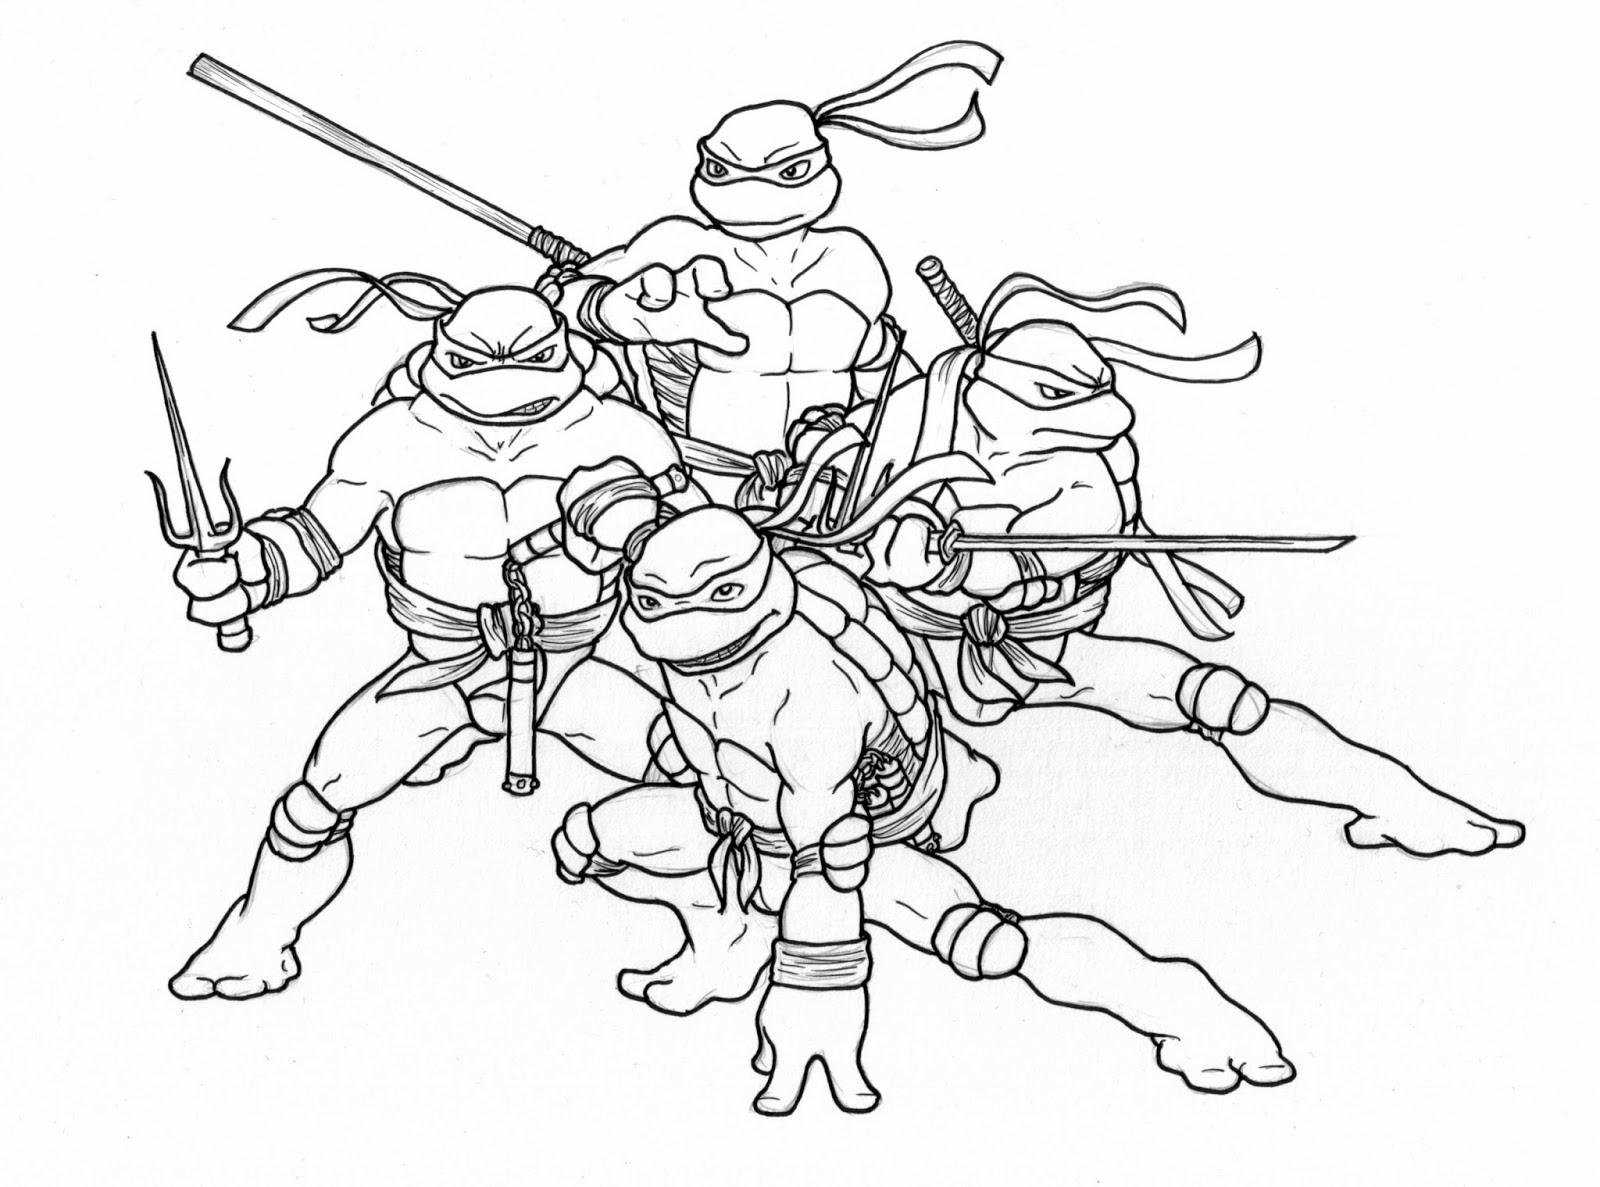 ninja turtles coloring pages printable fun coloring pages teenage mutant ninja turtles coloring coloring pages ninja printable turtles